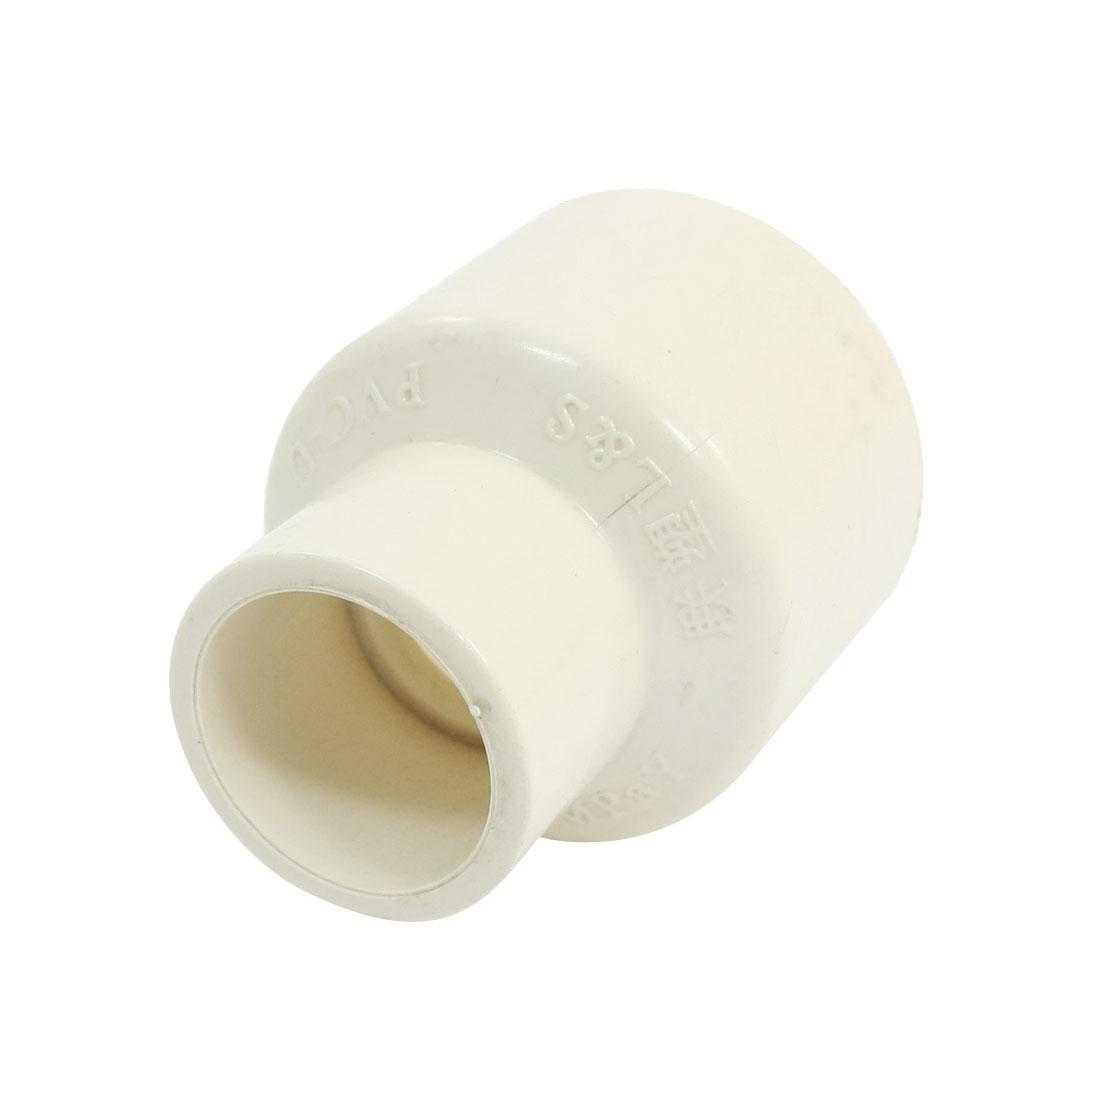 Slip x Slip White PVC Water Pipe Straight Connector Coupler 40 x 25mm